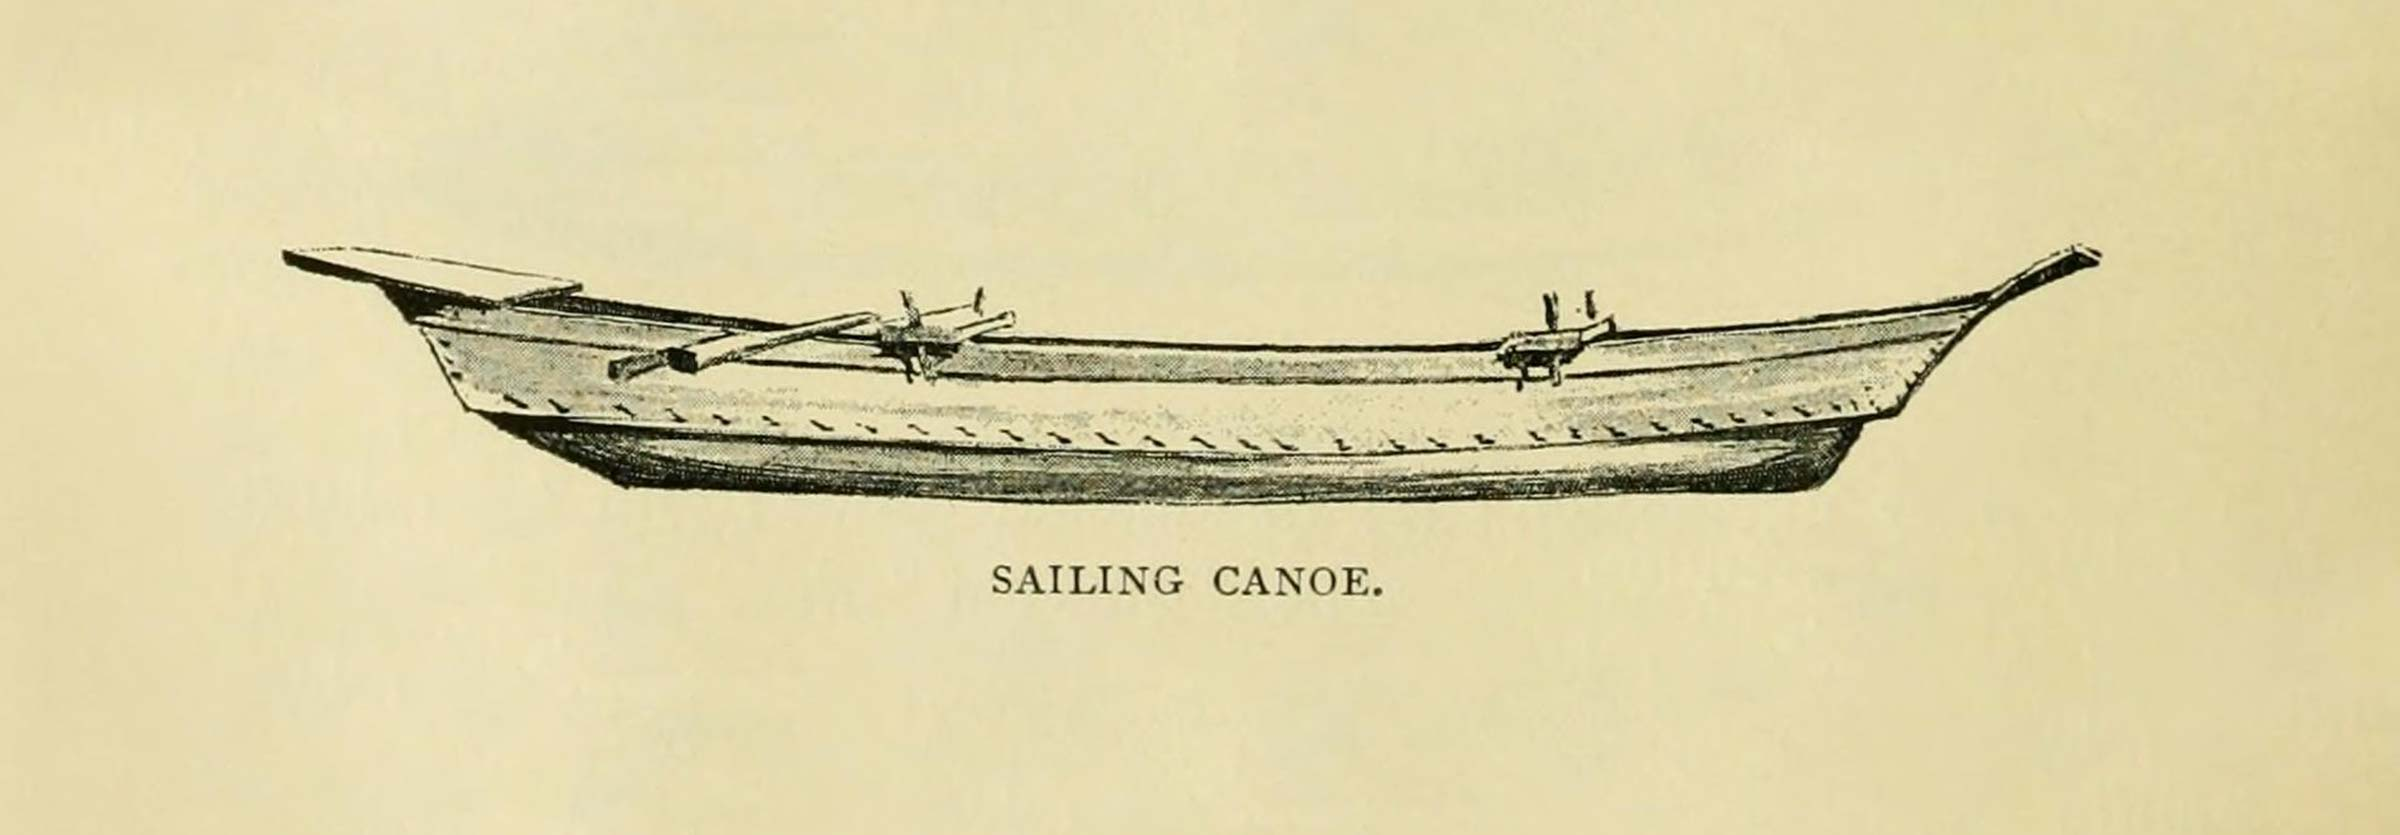 Ainu Sailing Canoe